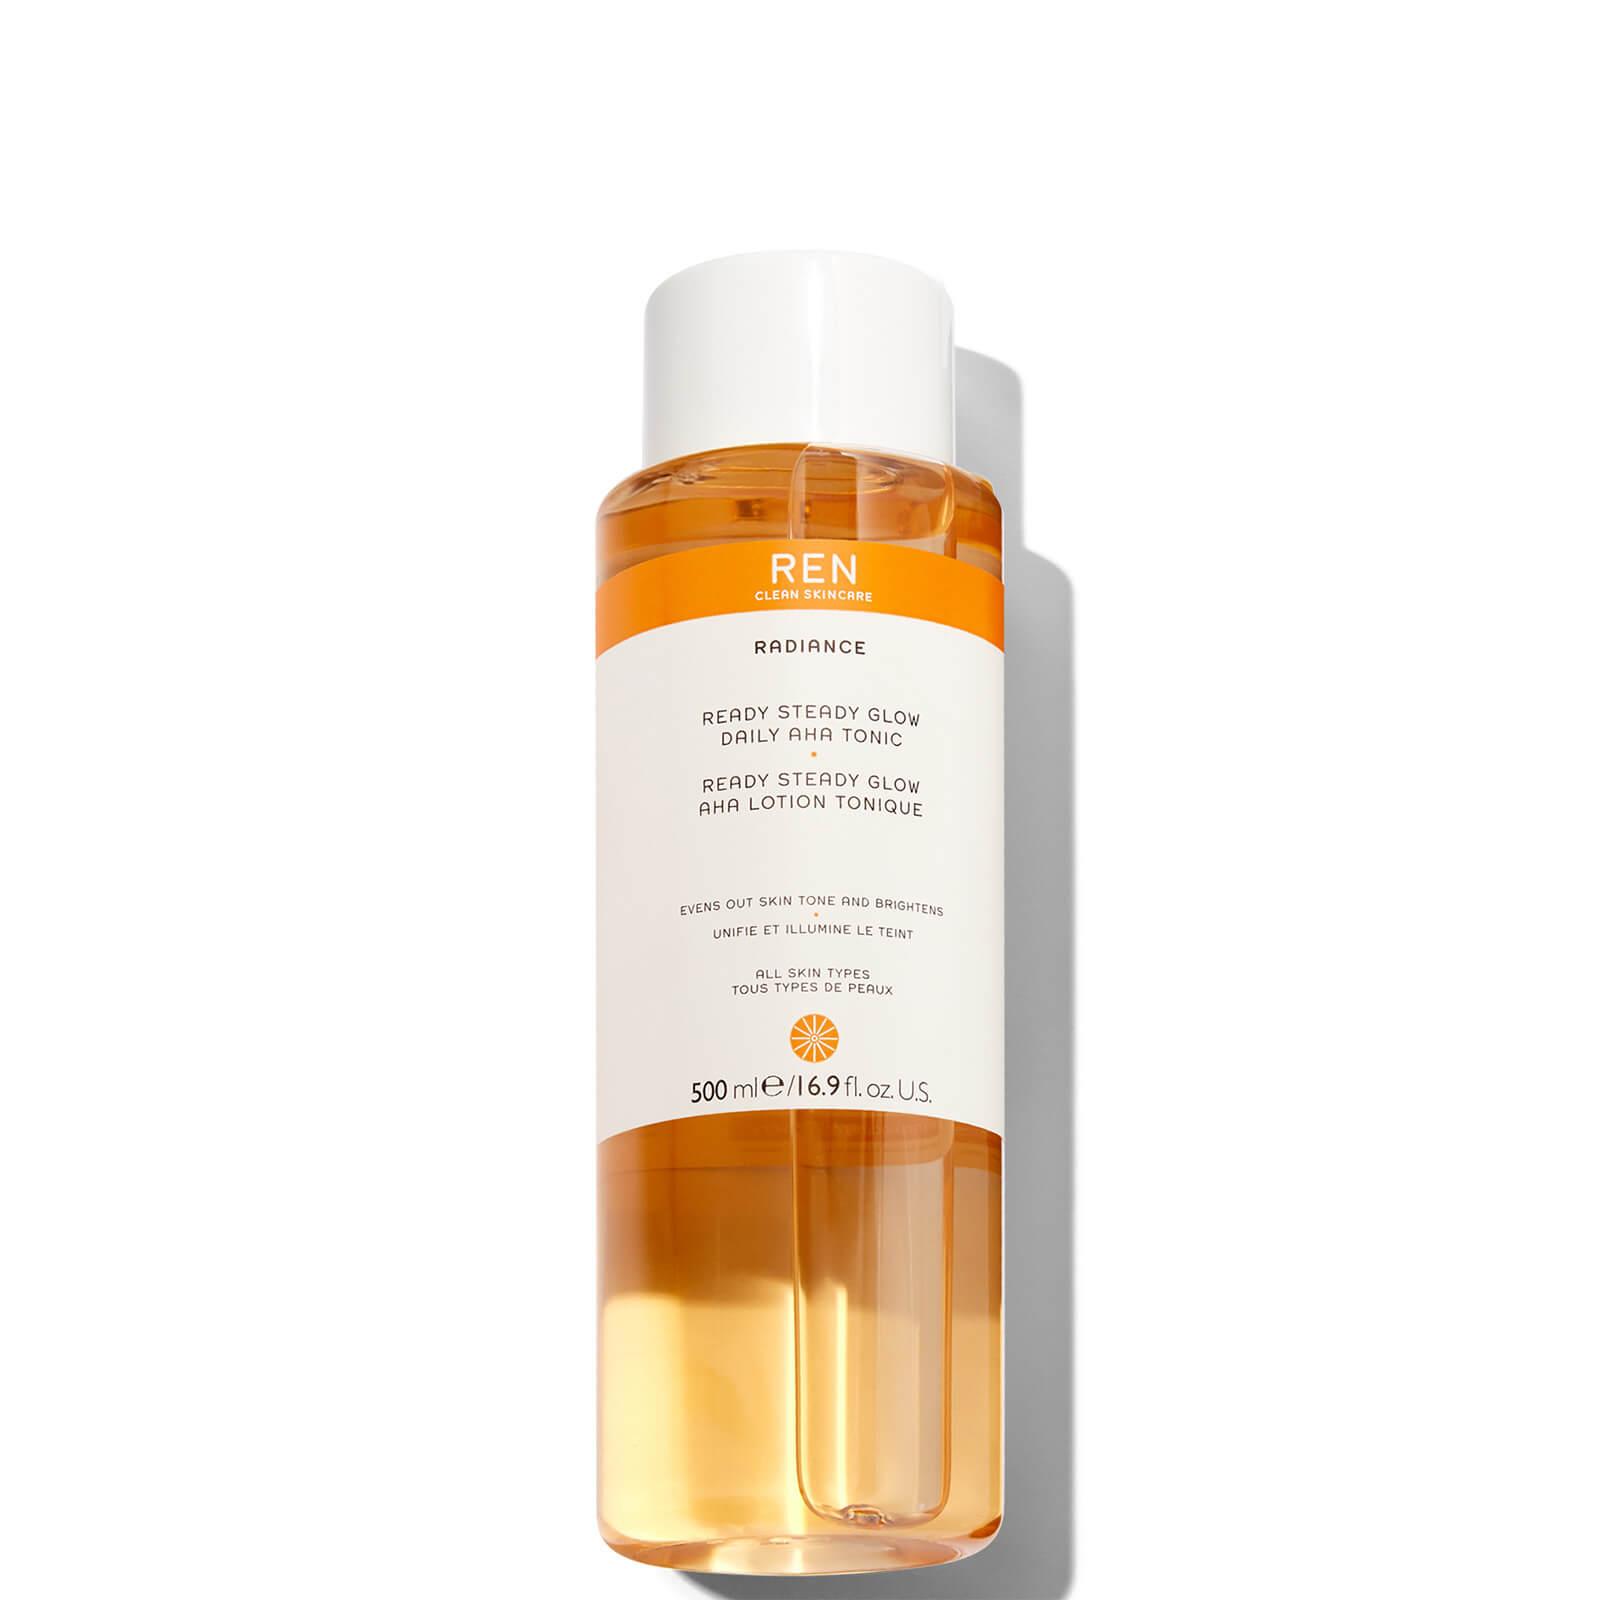 Купить REN Clean Skincare Supersize Ready Steady Glow Daily AHA Tonic 500ml